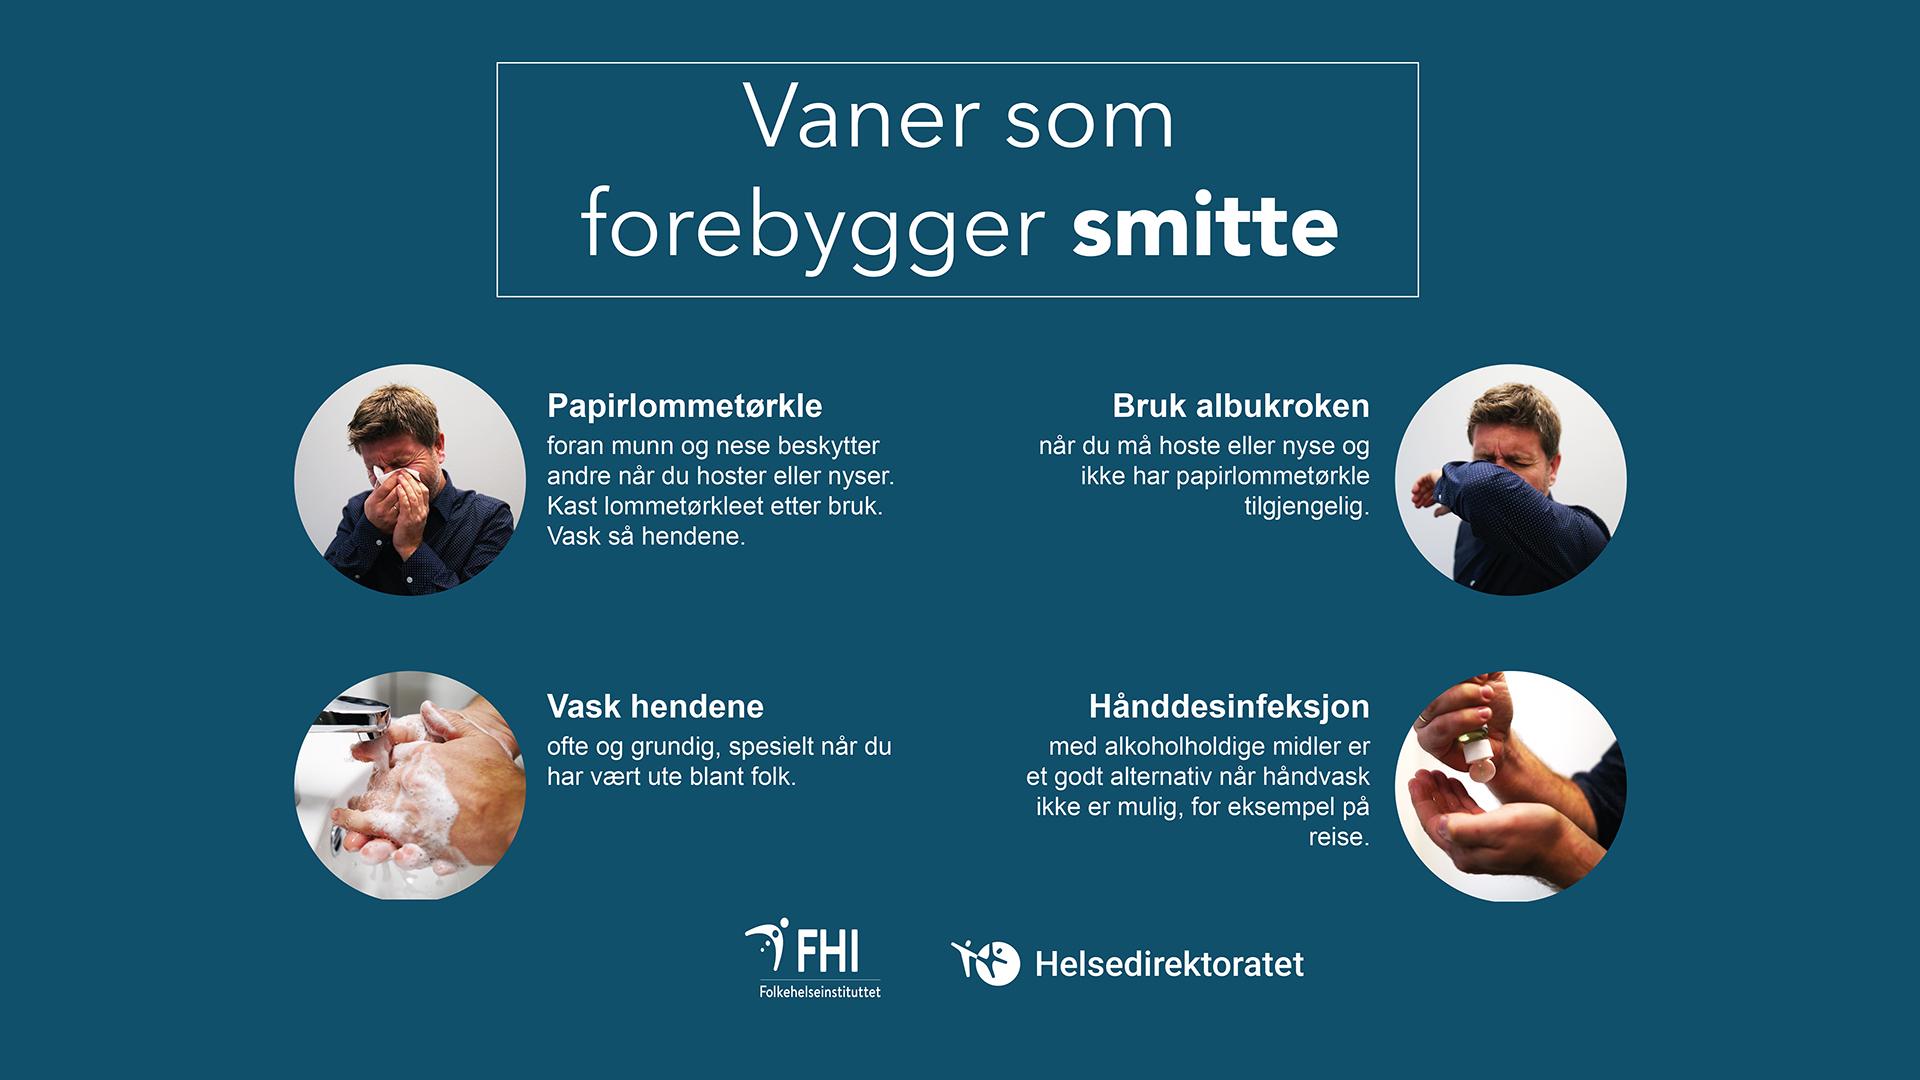 Smitte_Forebyggende_1920x1080